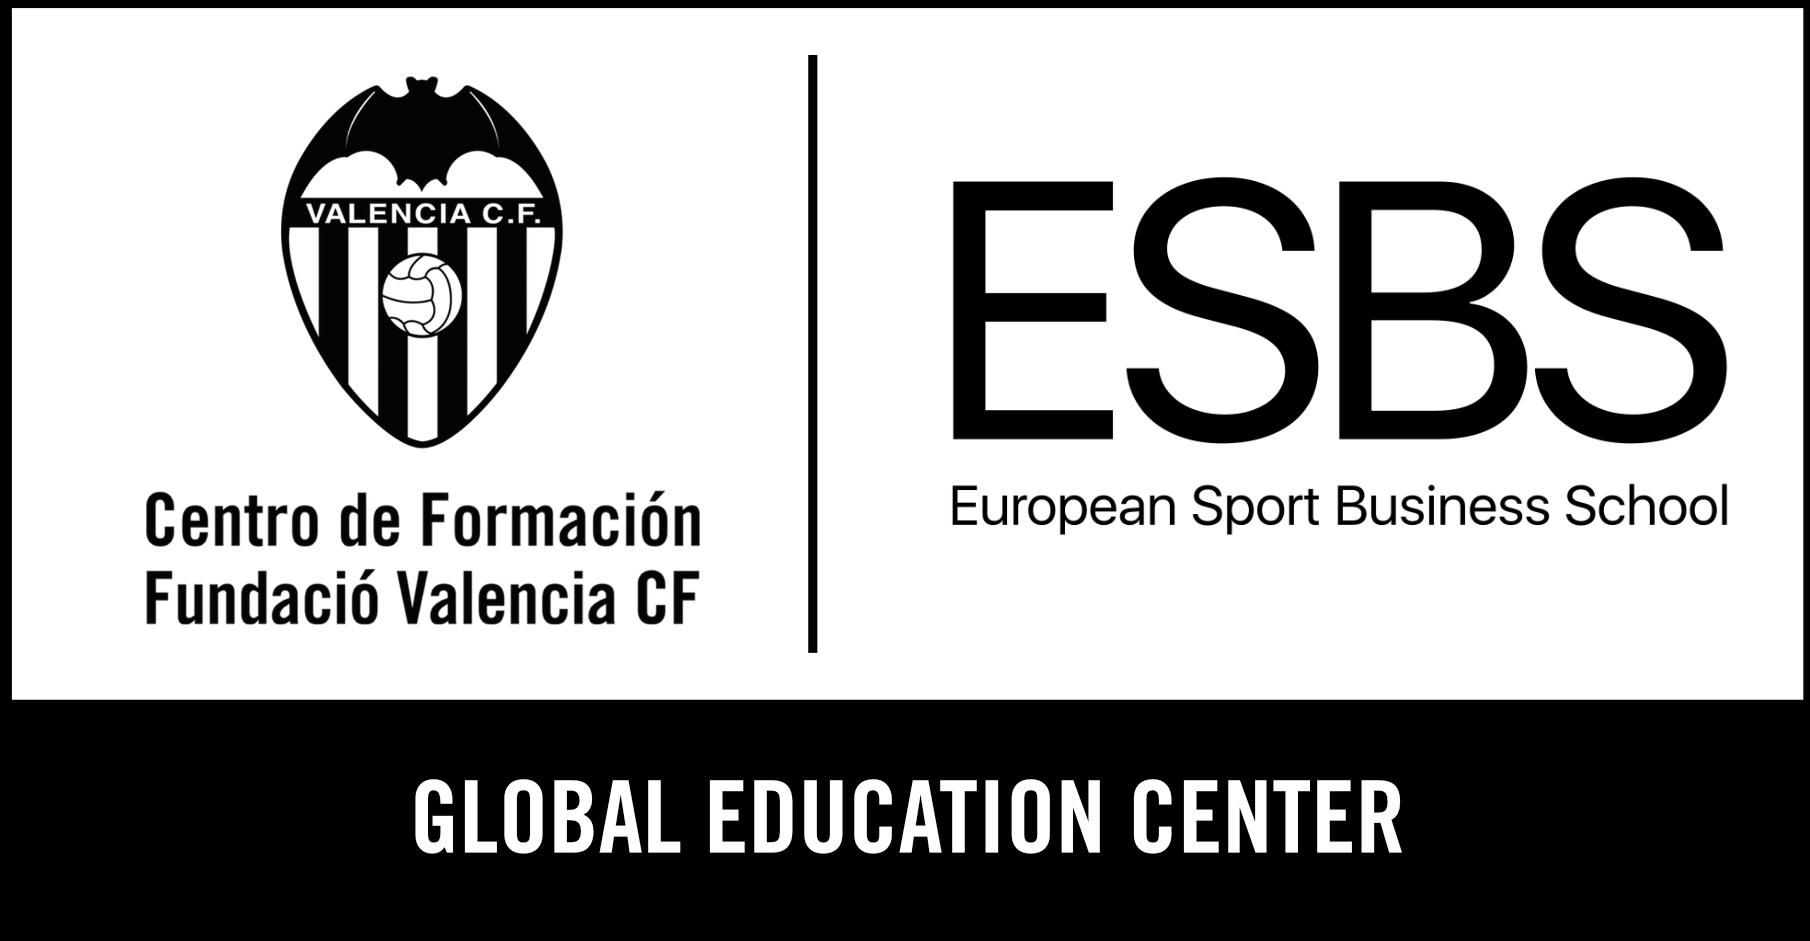 ESBS European Sport Business School